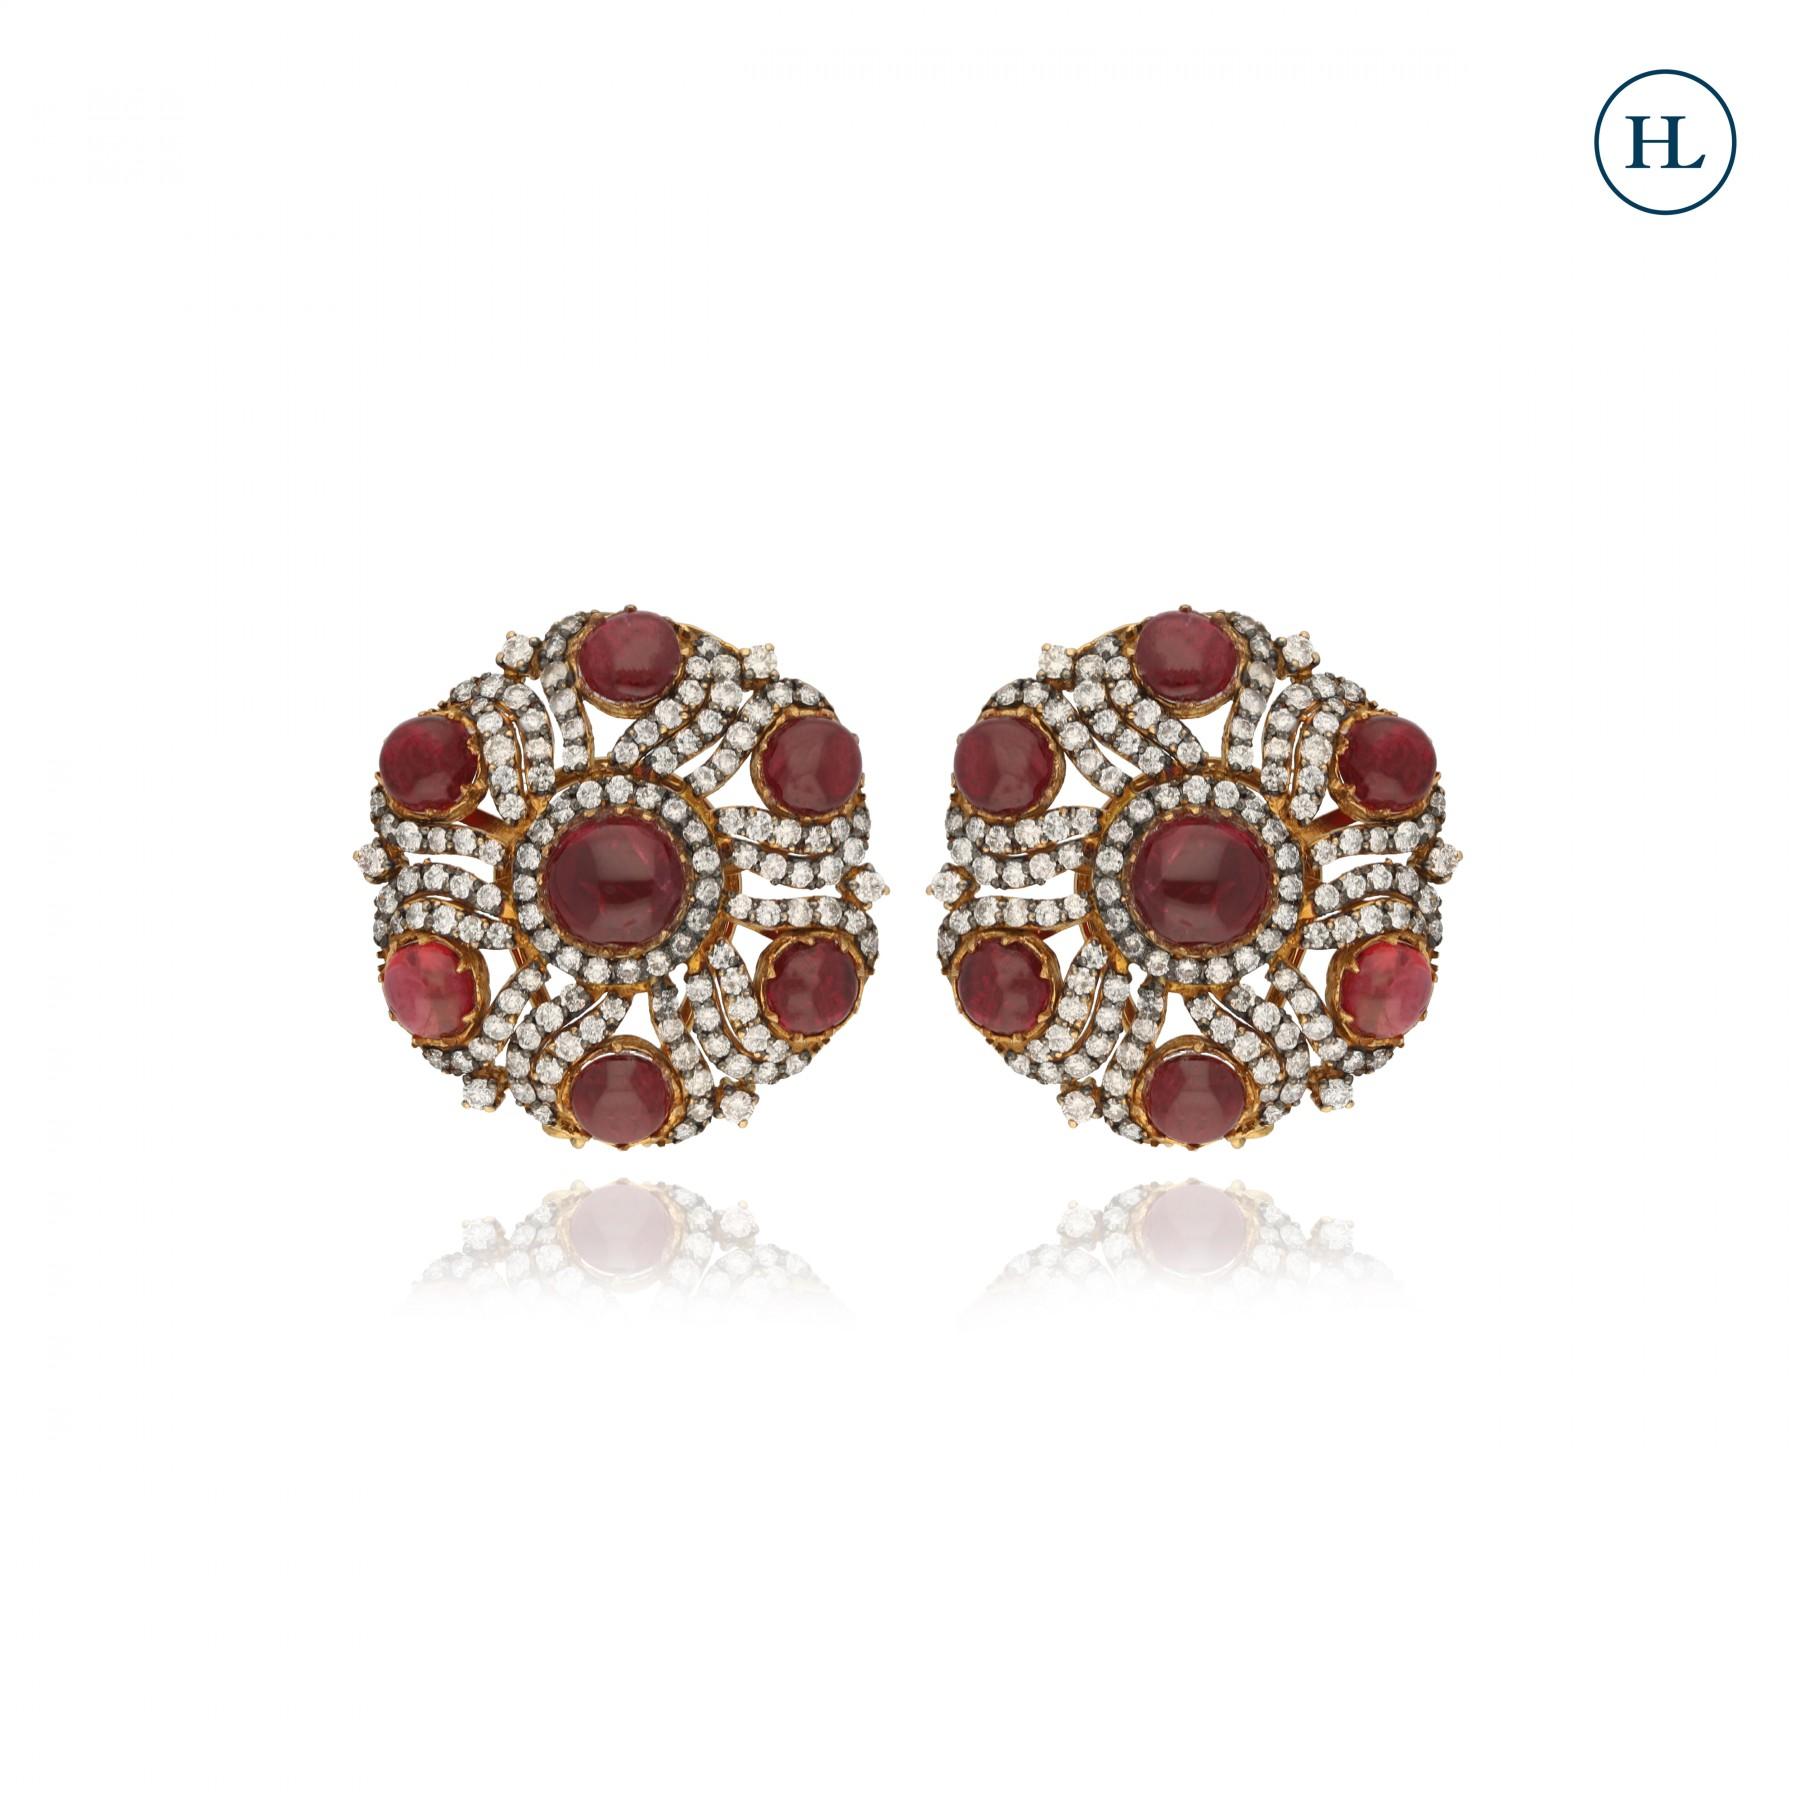 Antique-Styled Diamonds & Ruby Earrings